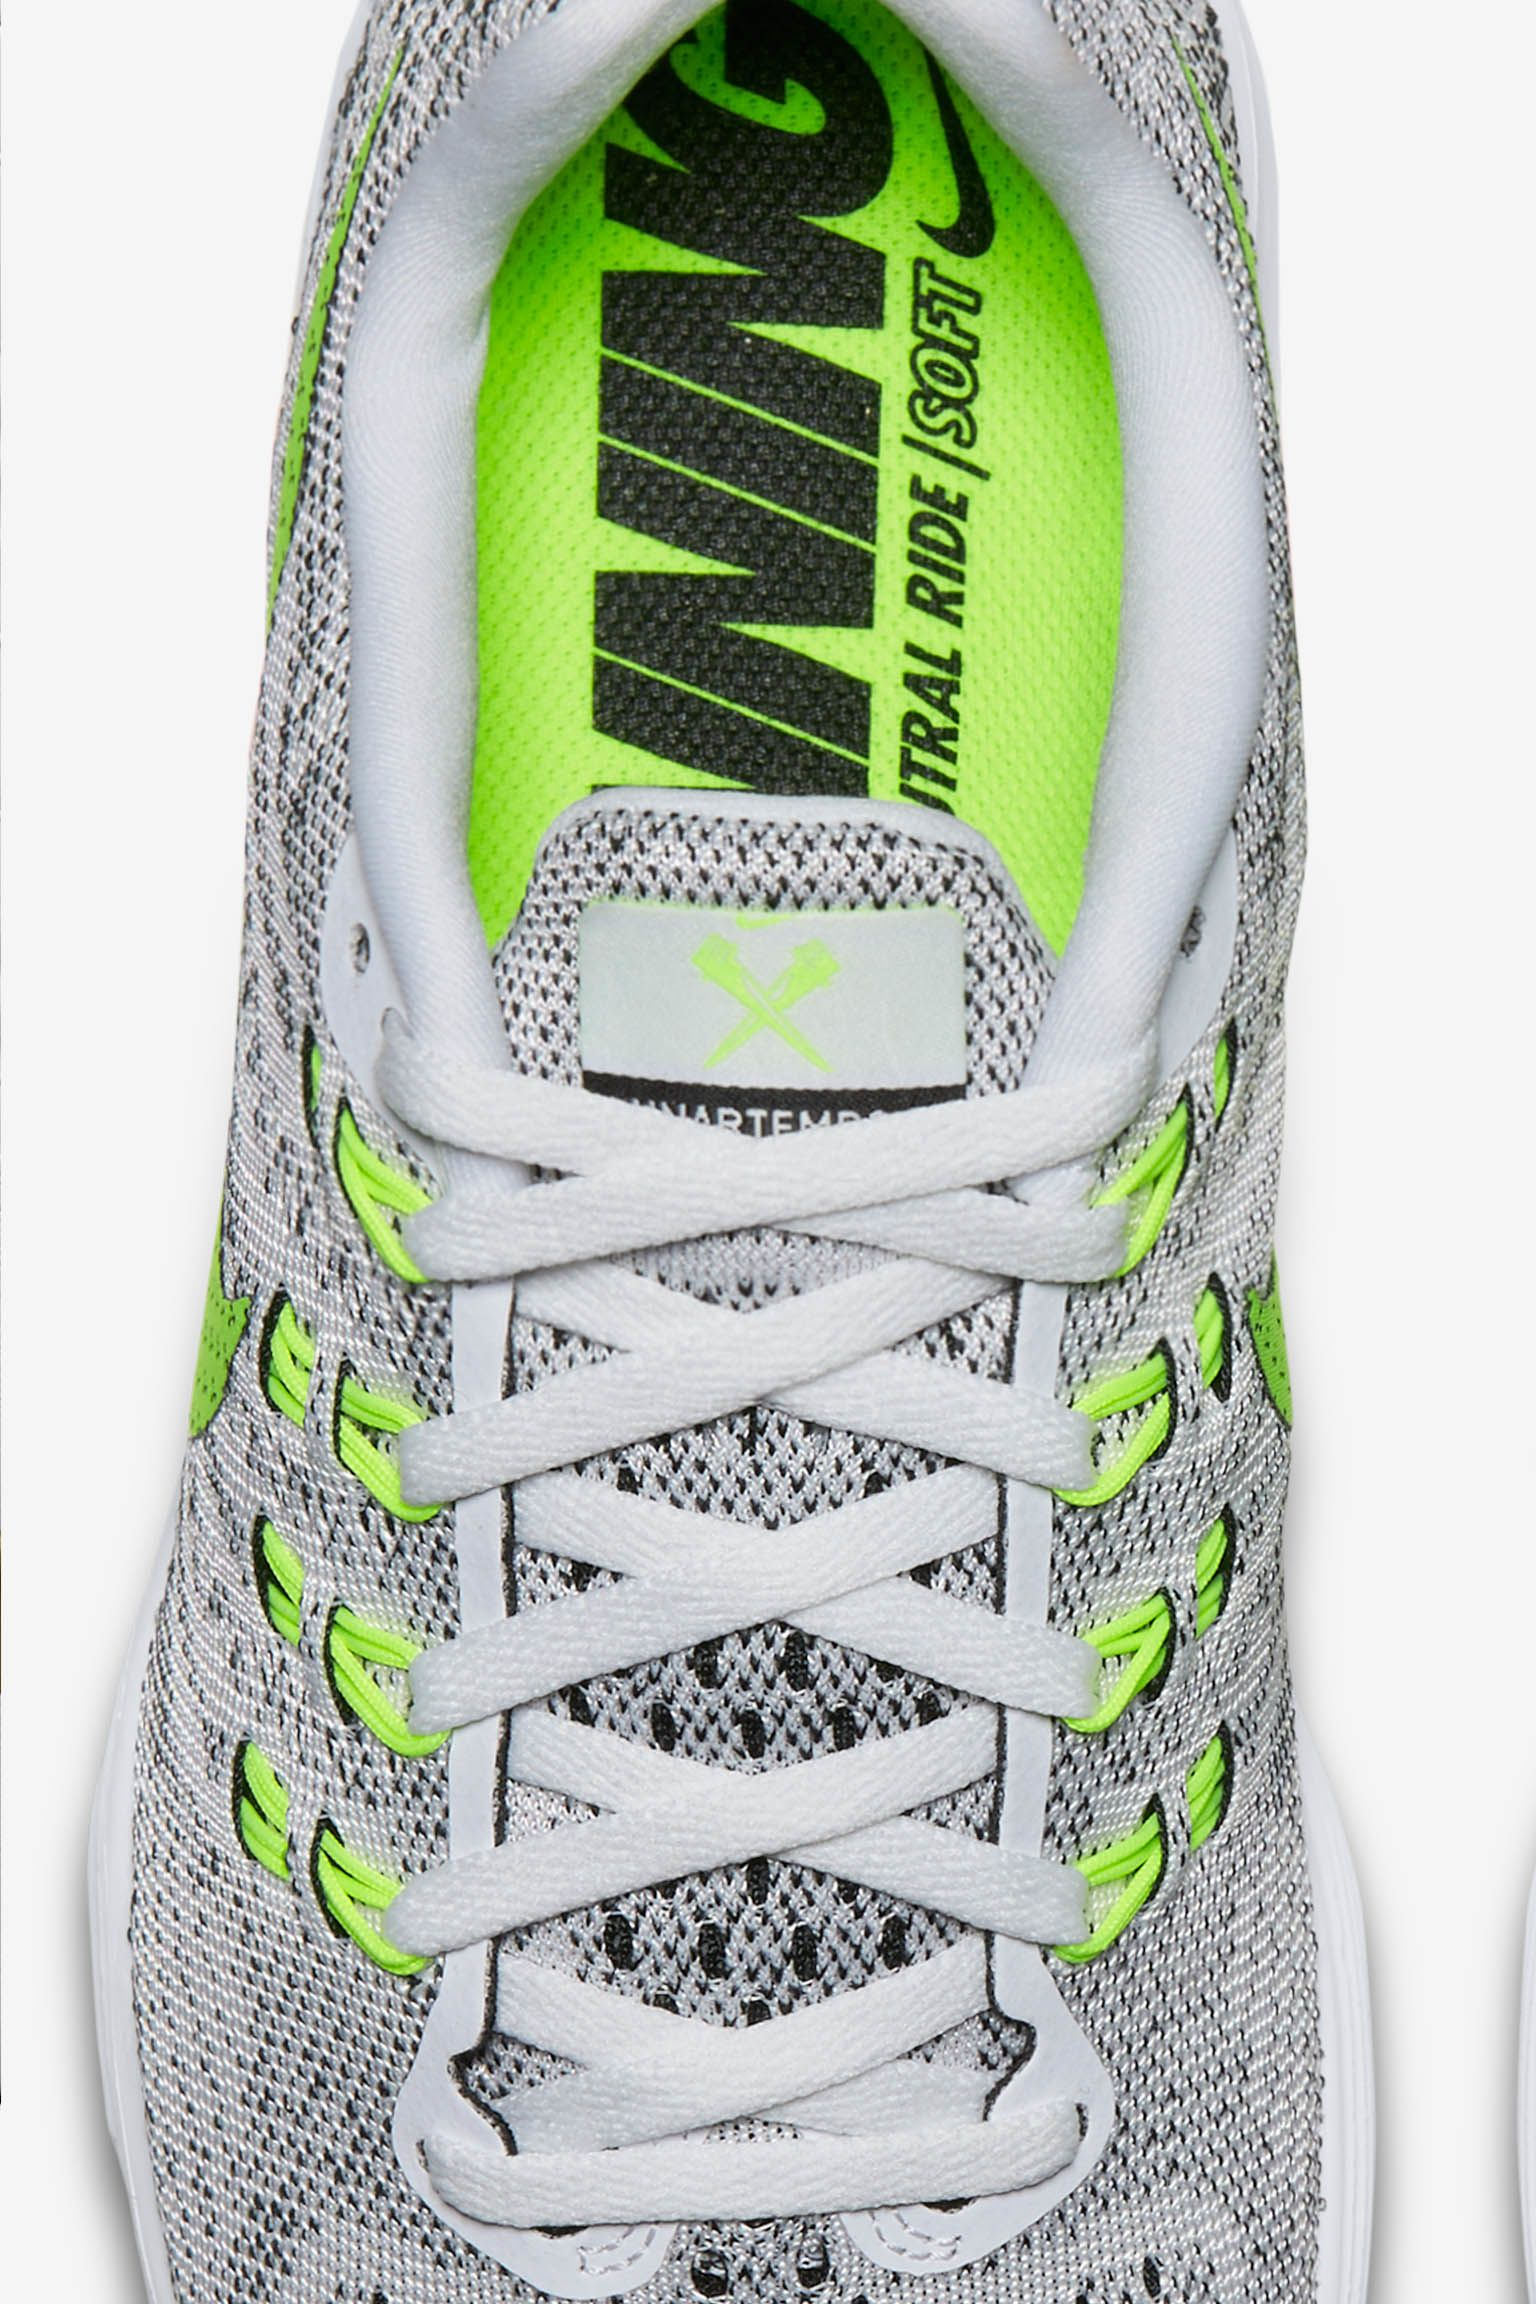 Women's Nike Lunartempo 2 'White & Volt-Black'